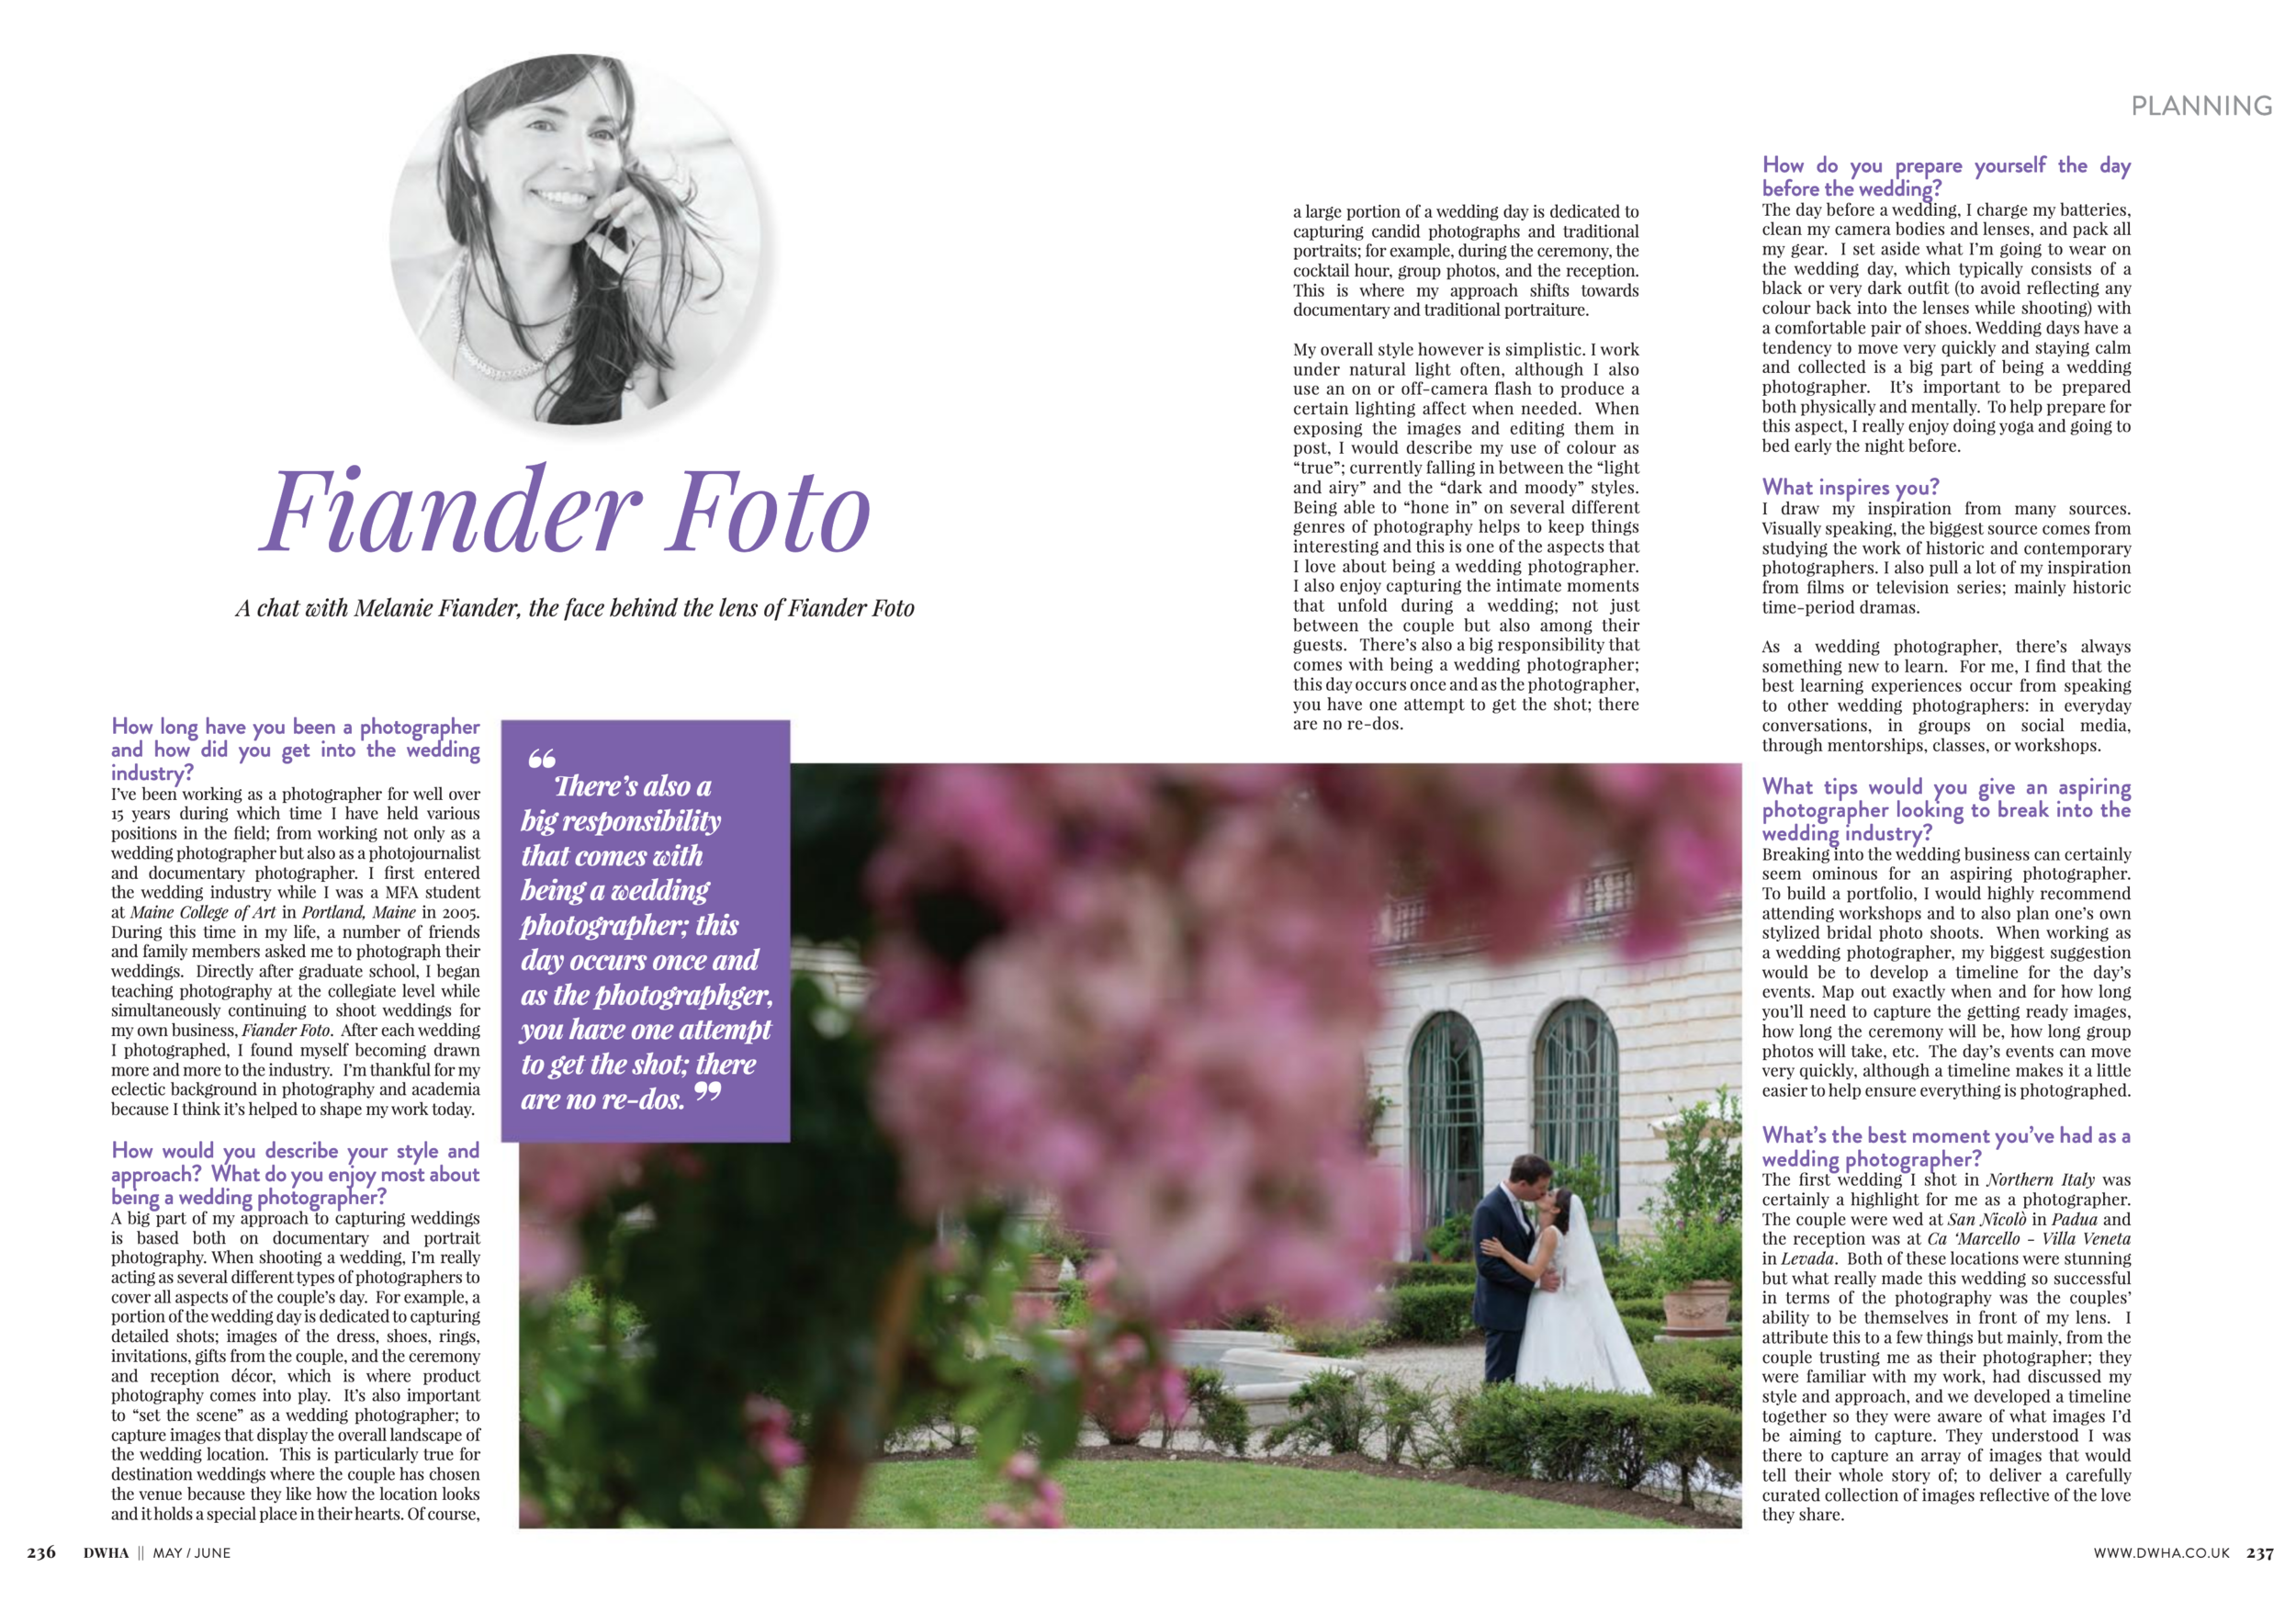 Destination Wedding Photographer_Fiander Foto_Destination Weddings and Honeymoons Abroad_Interview_June 2019_2.png